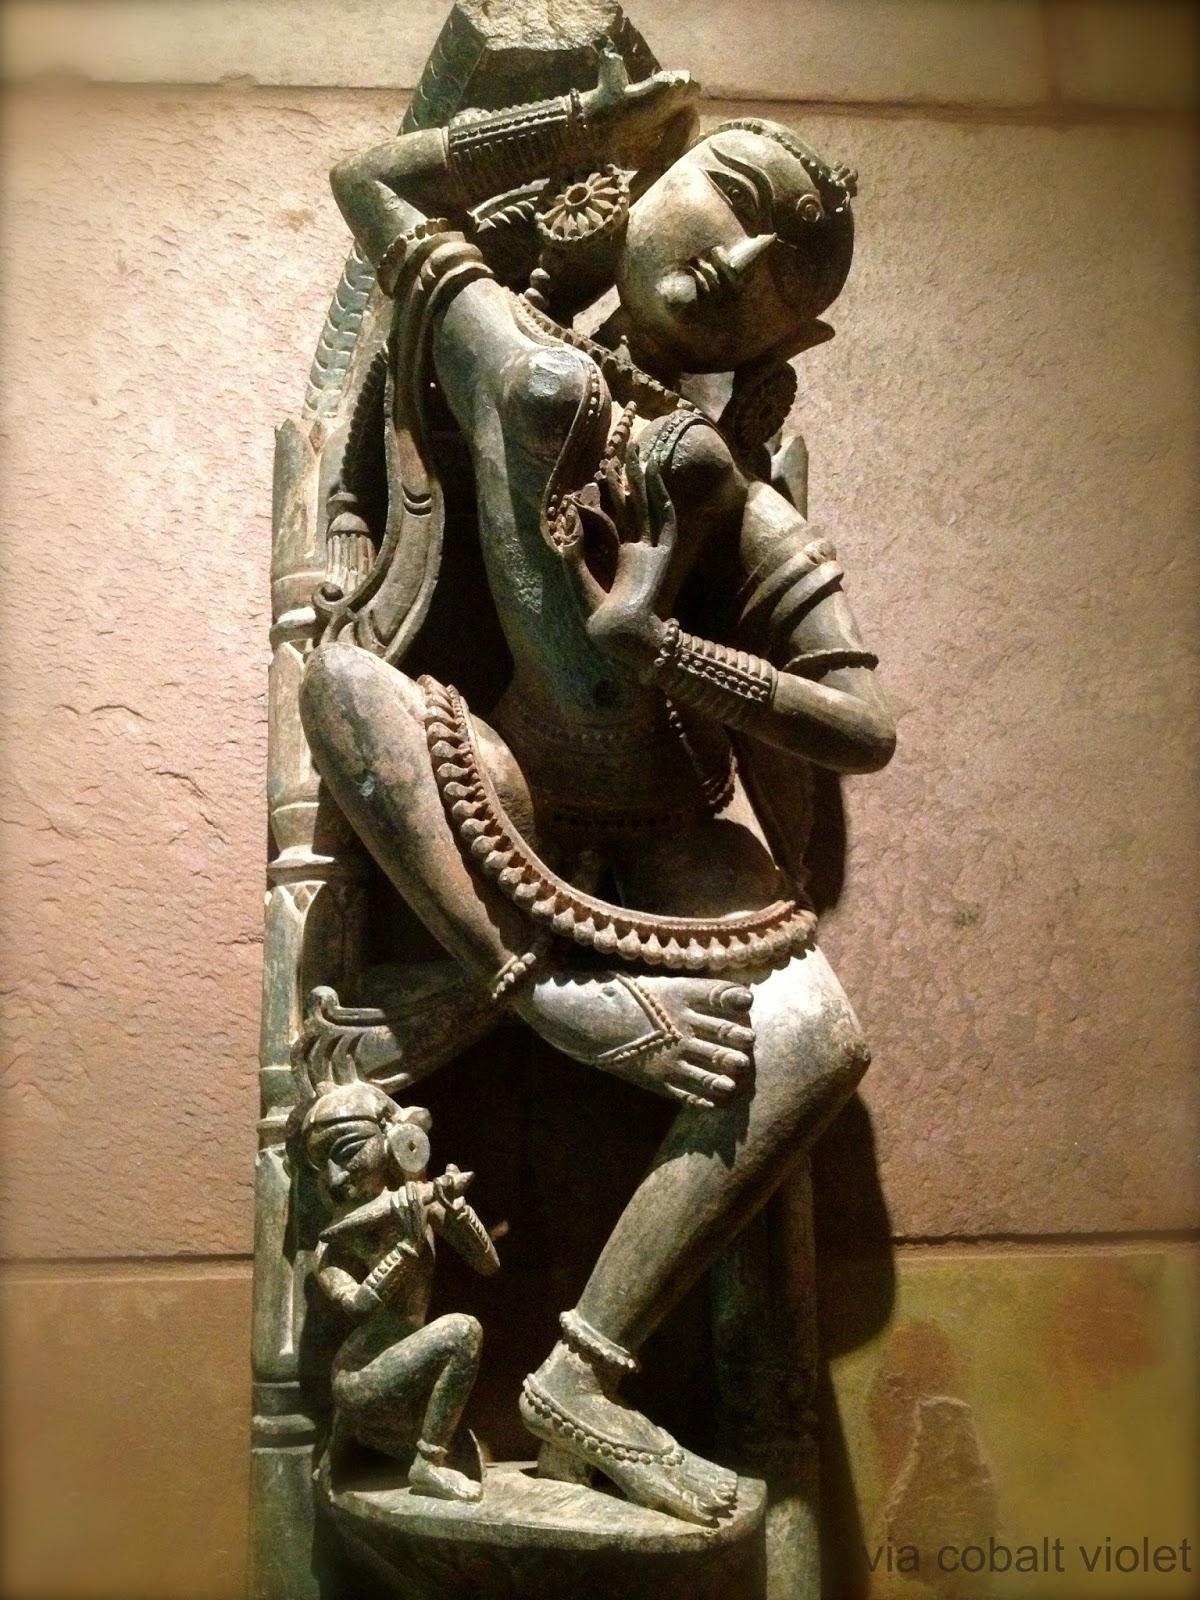 Vishnu and shiva at the norton